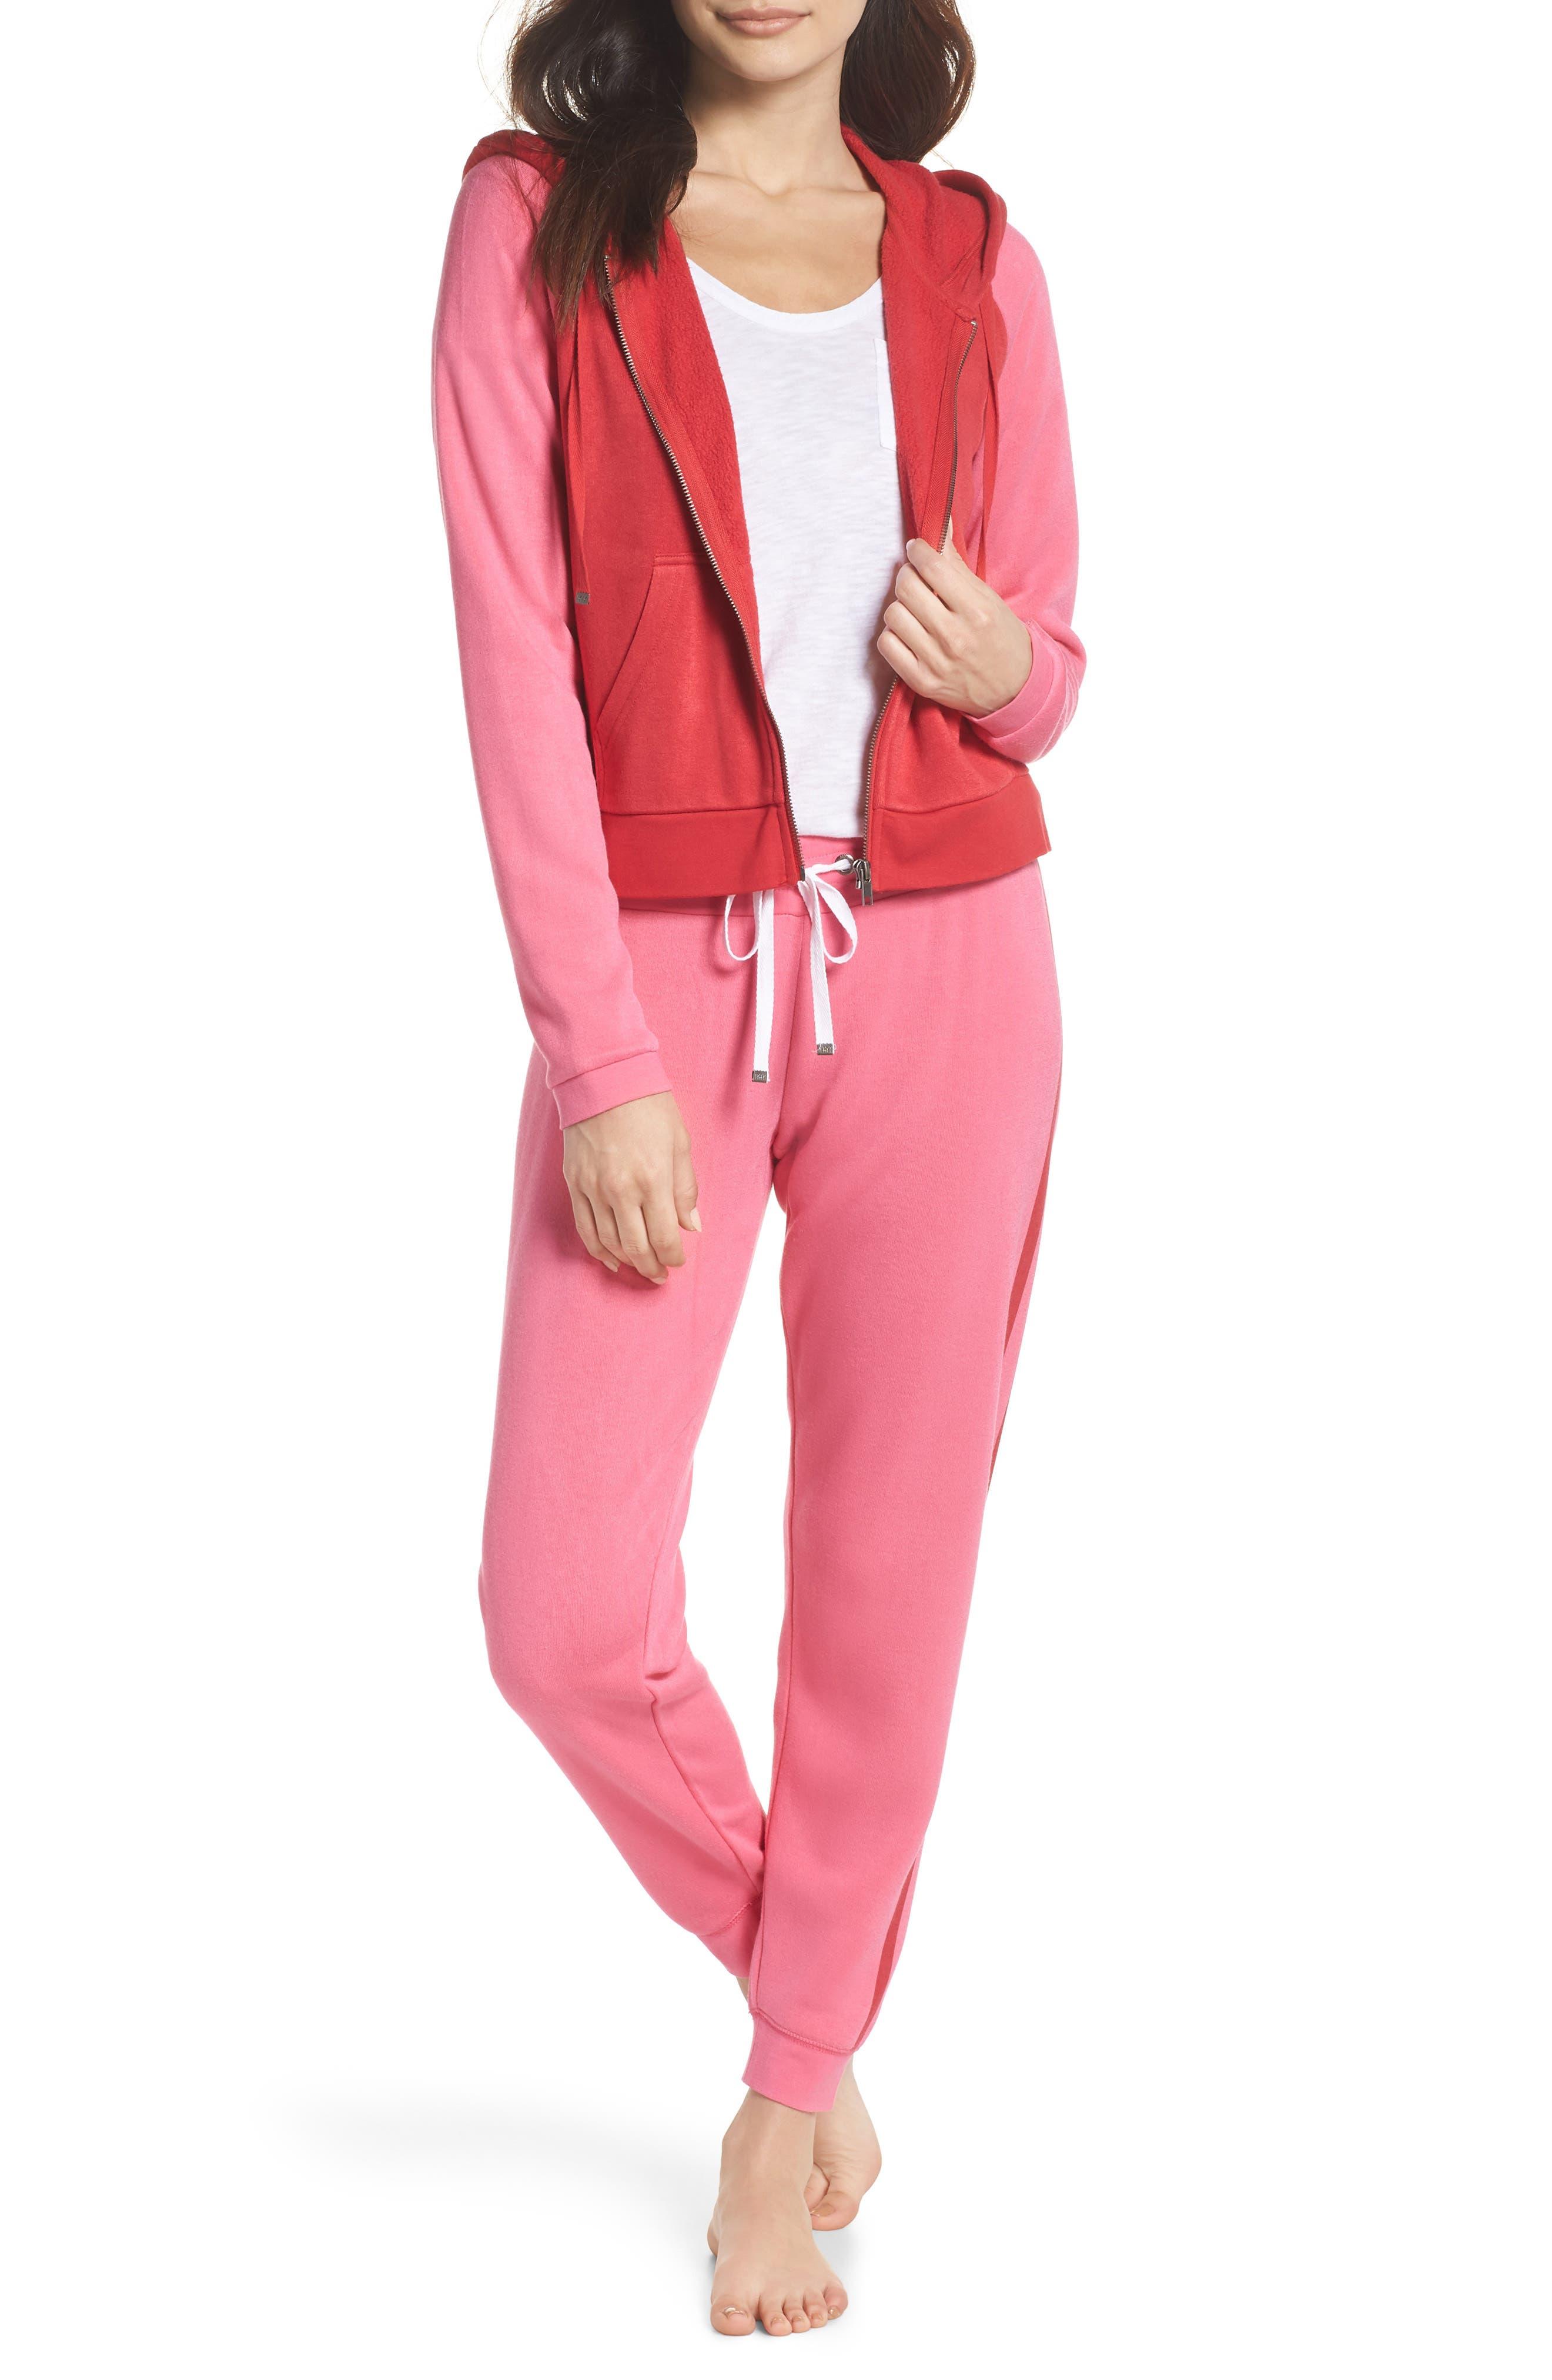 Firecracker Jogger Pajama Pants,                             Alternate thumbnail 4, color,                             Pink Fandango